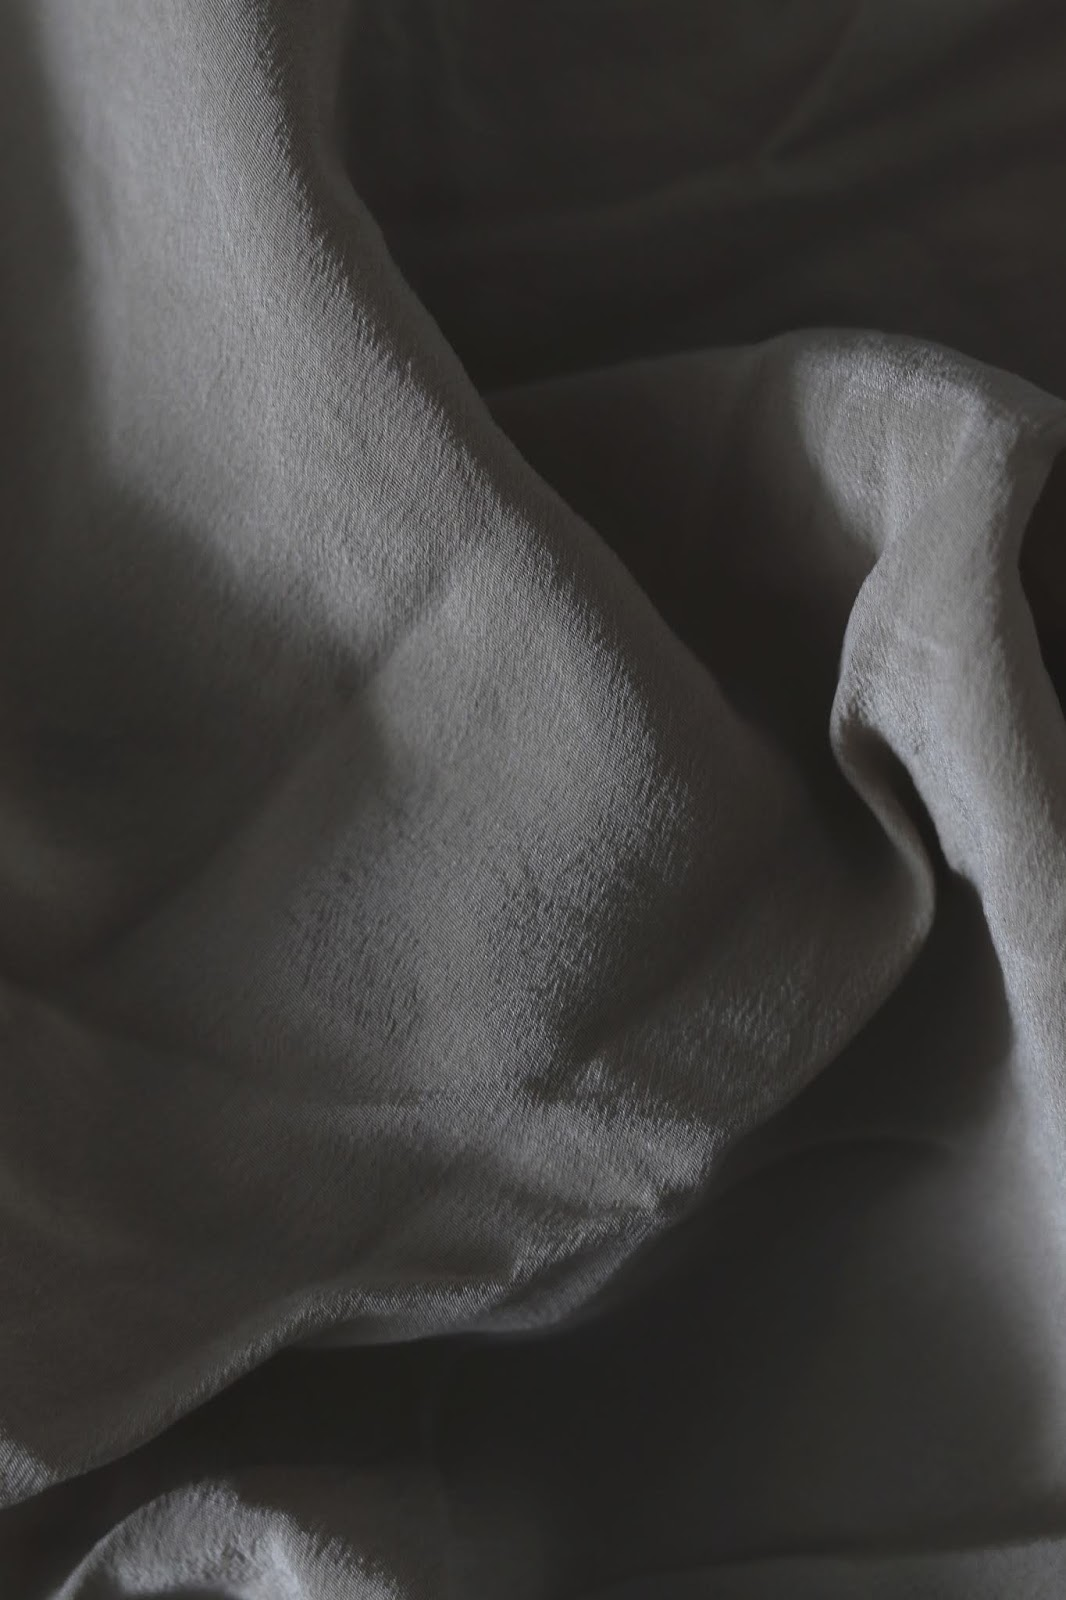 Giorgio Armani Beauty Luminous Silk Multi-Purpose Concealer: A quick review